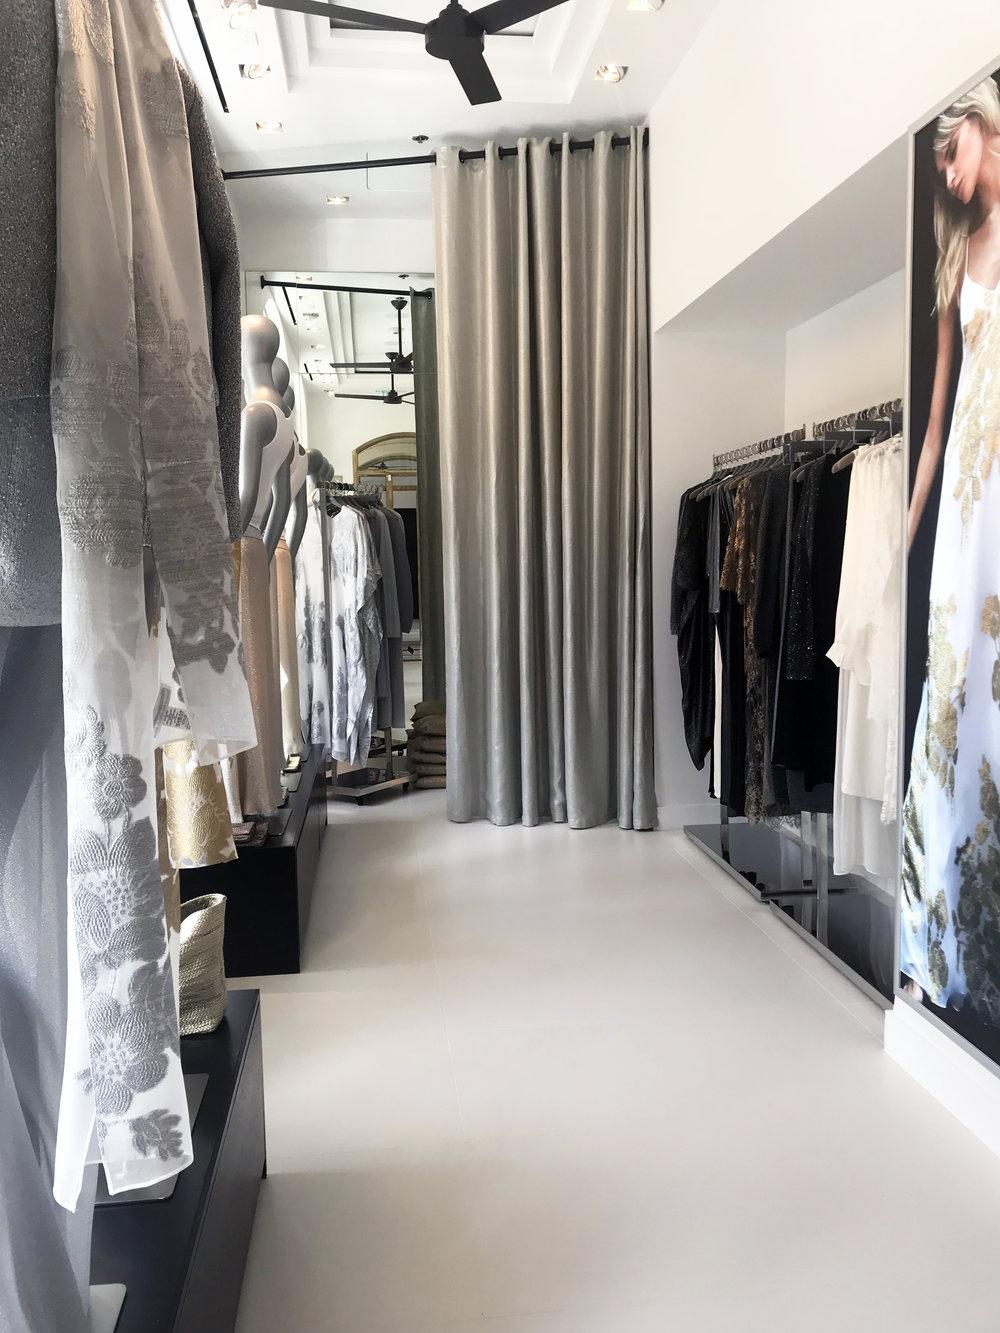 Marie france van Damme retail design storefront interior design commercial